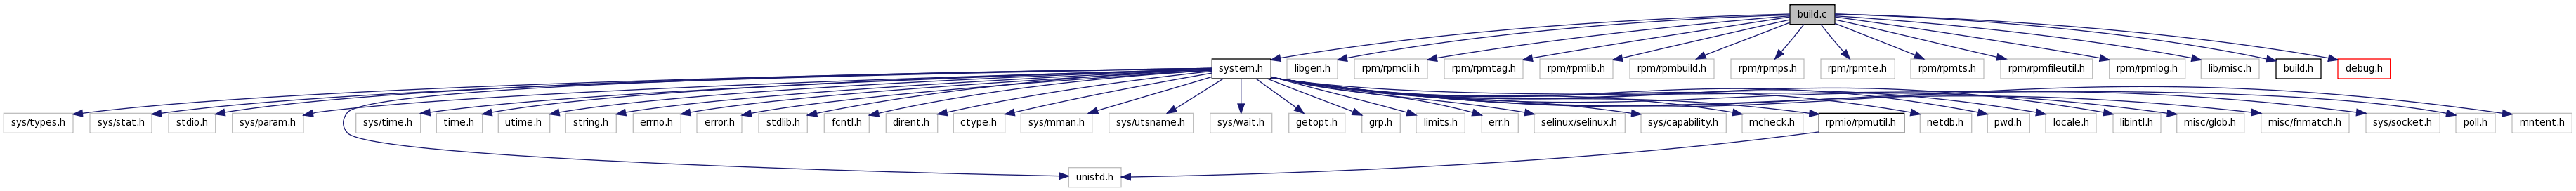 doc/librpm/html/build_8c__incl.png